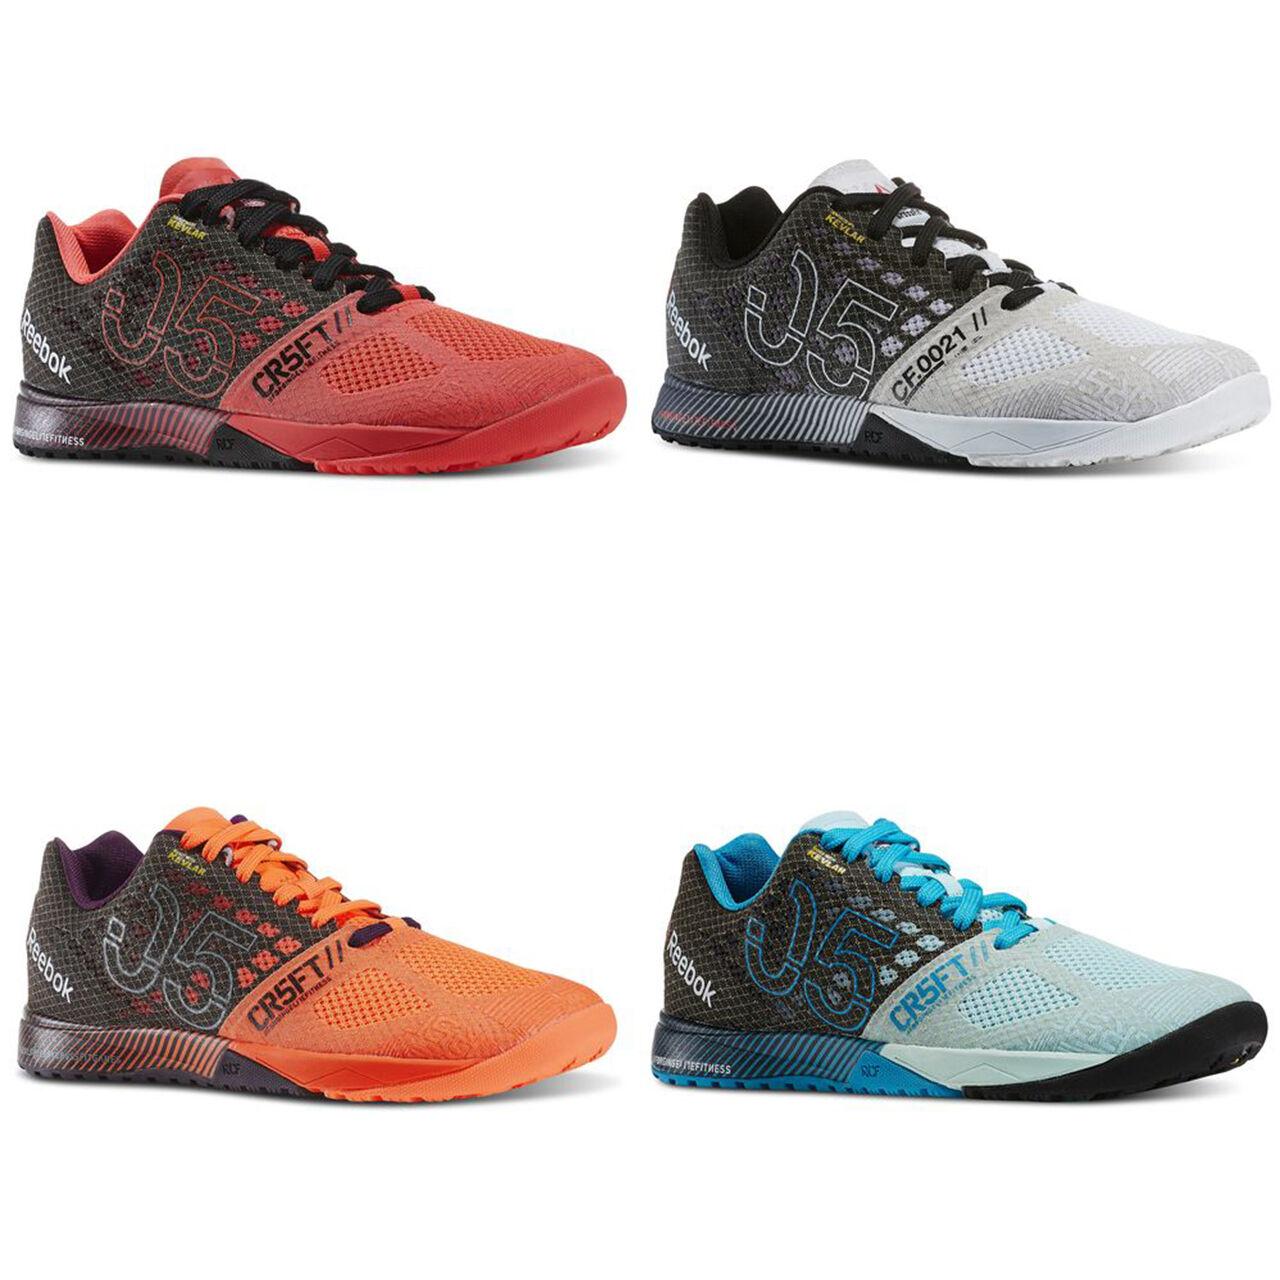 R Crossfit Nano 5.0 Chaussures De Fitness Hommes Reebok z5b91ZmBbw